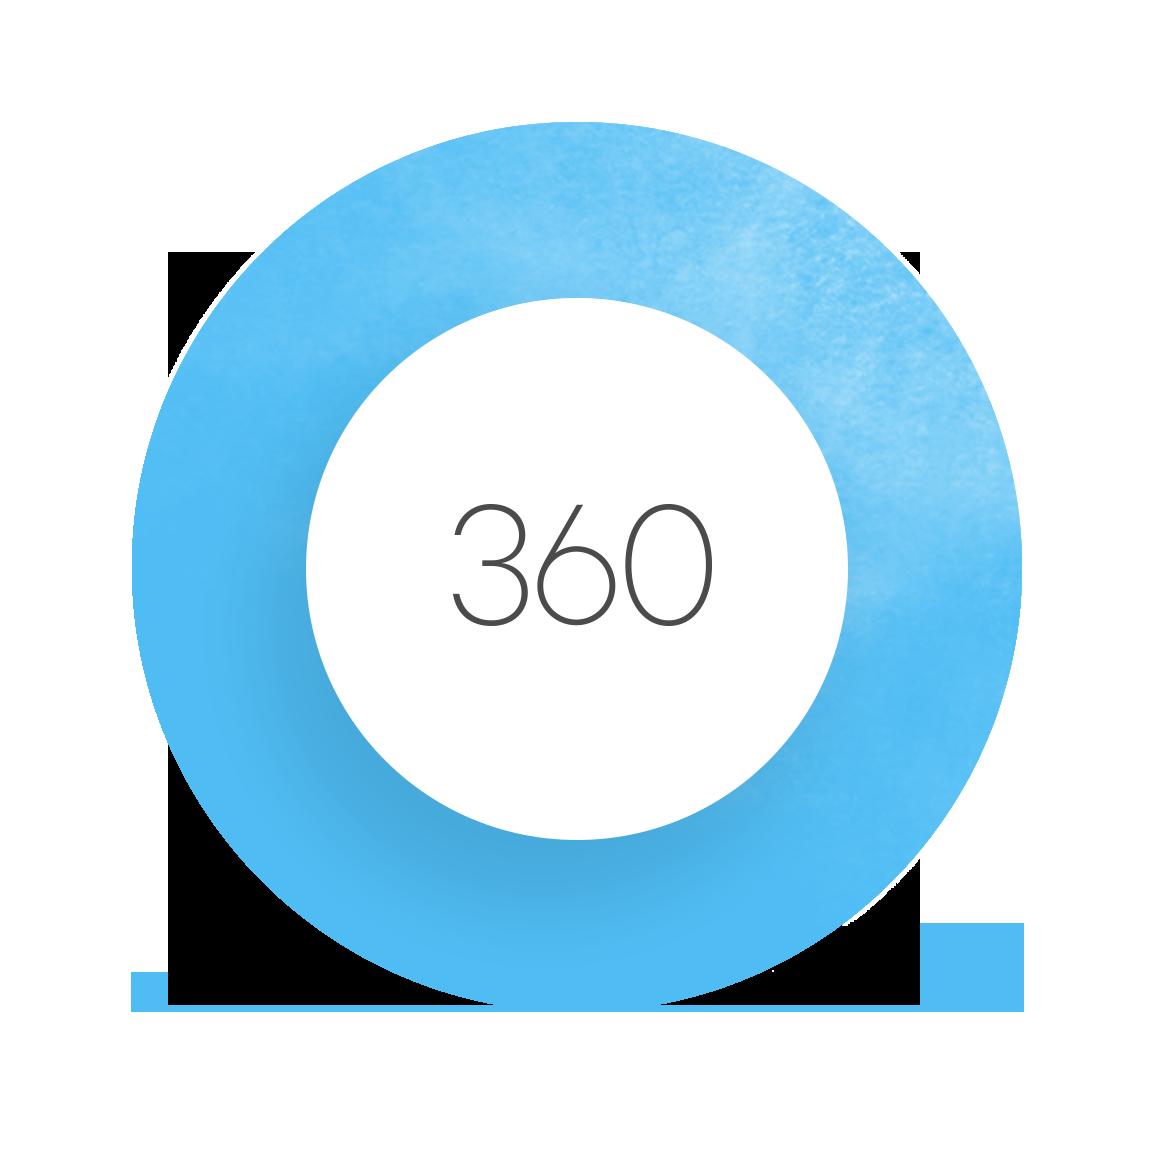 Articulate_360_logo_groß